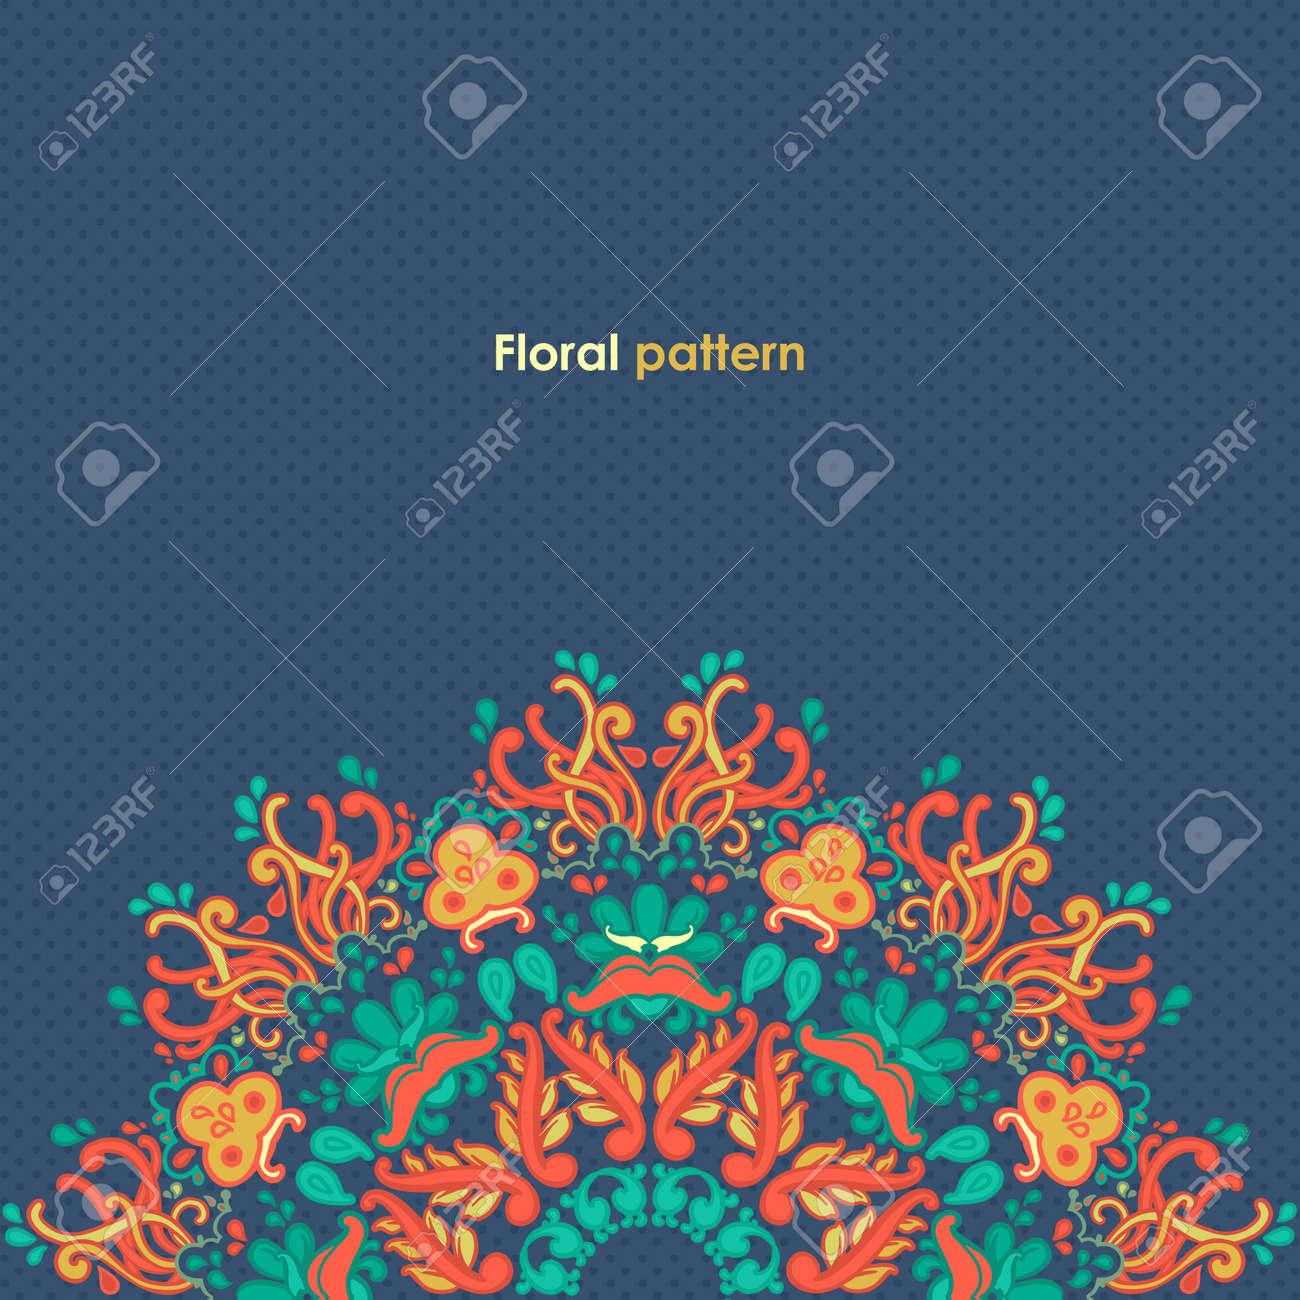 Ornamental round floral lace pattern kaleidoscopic floral pattern, mandala - 15391190